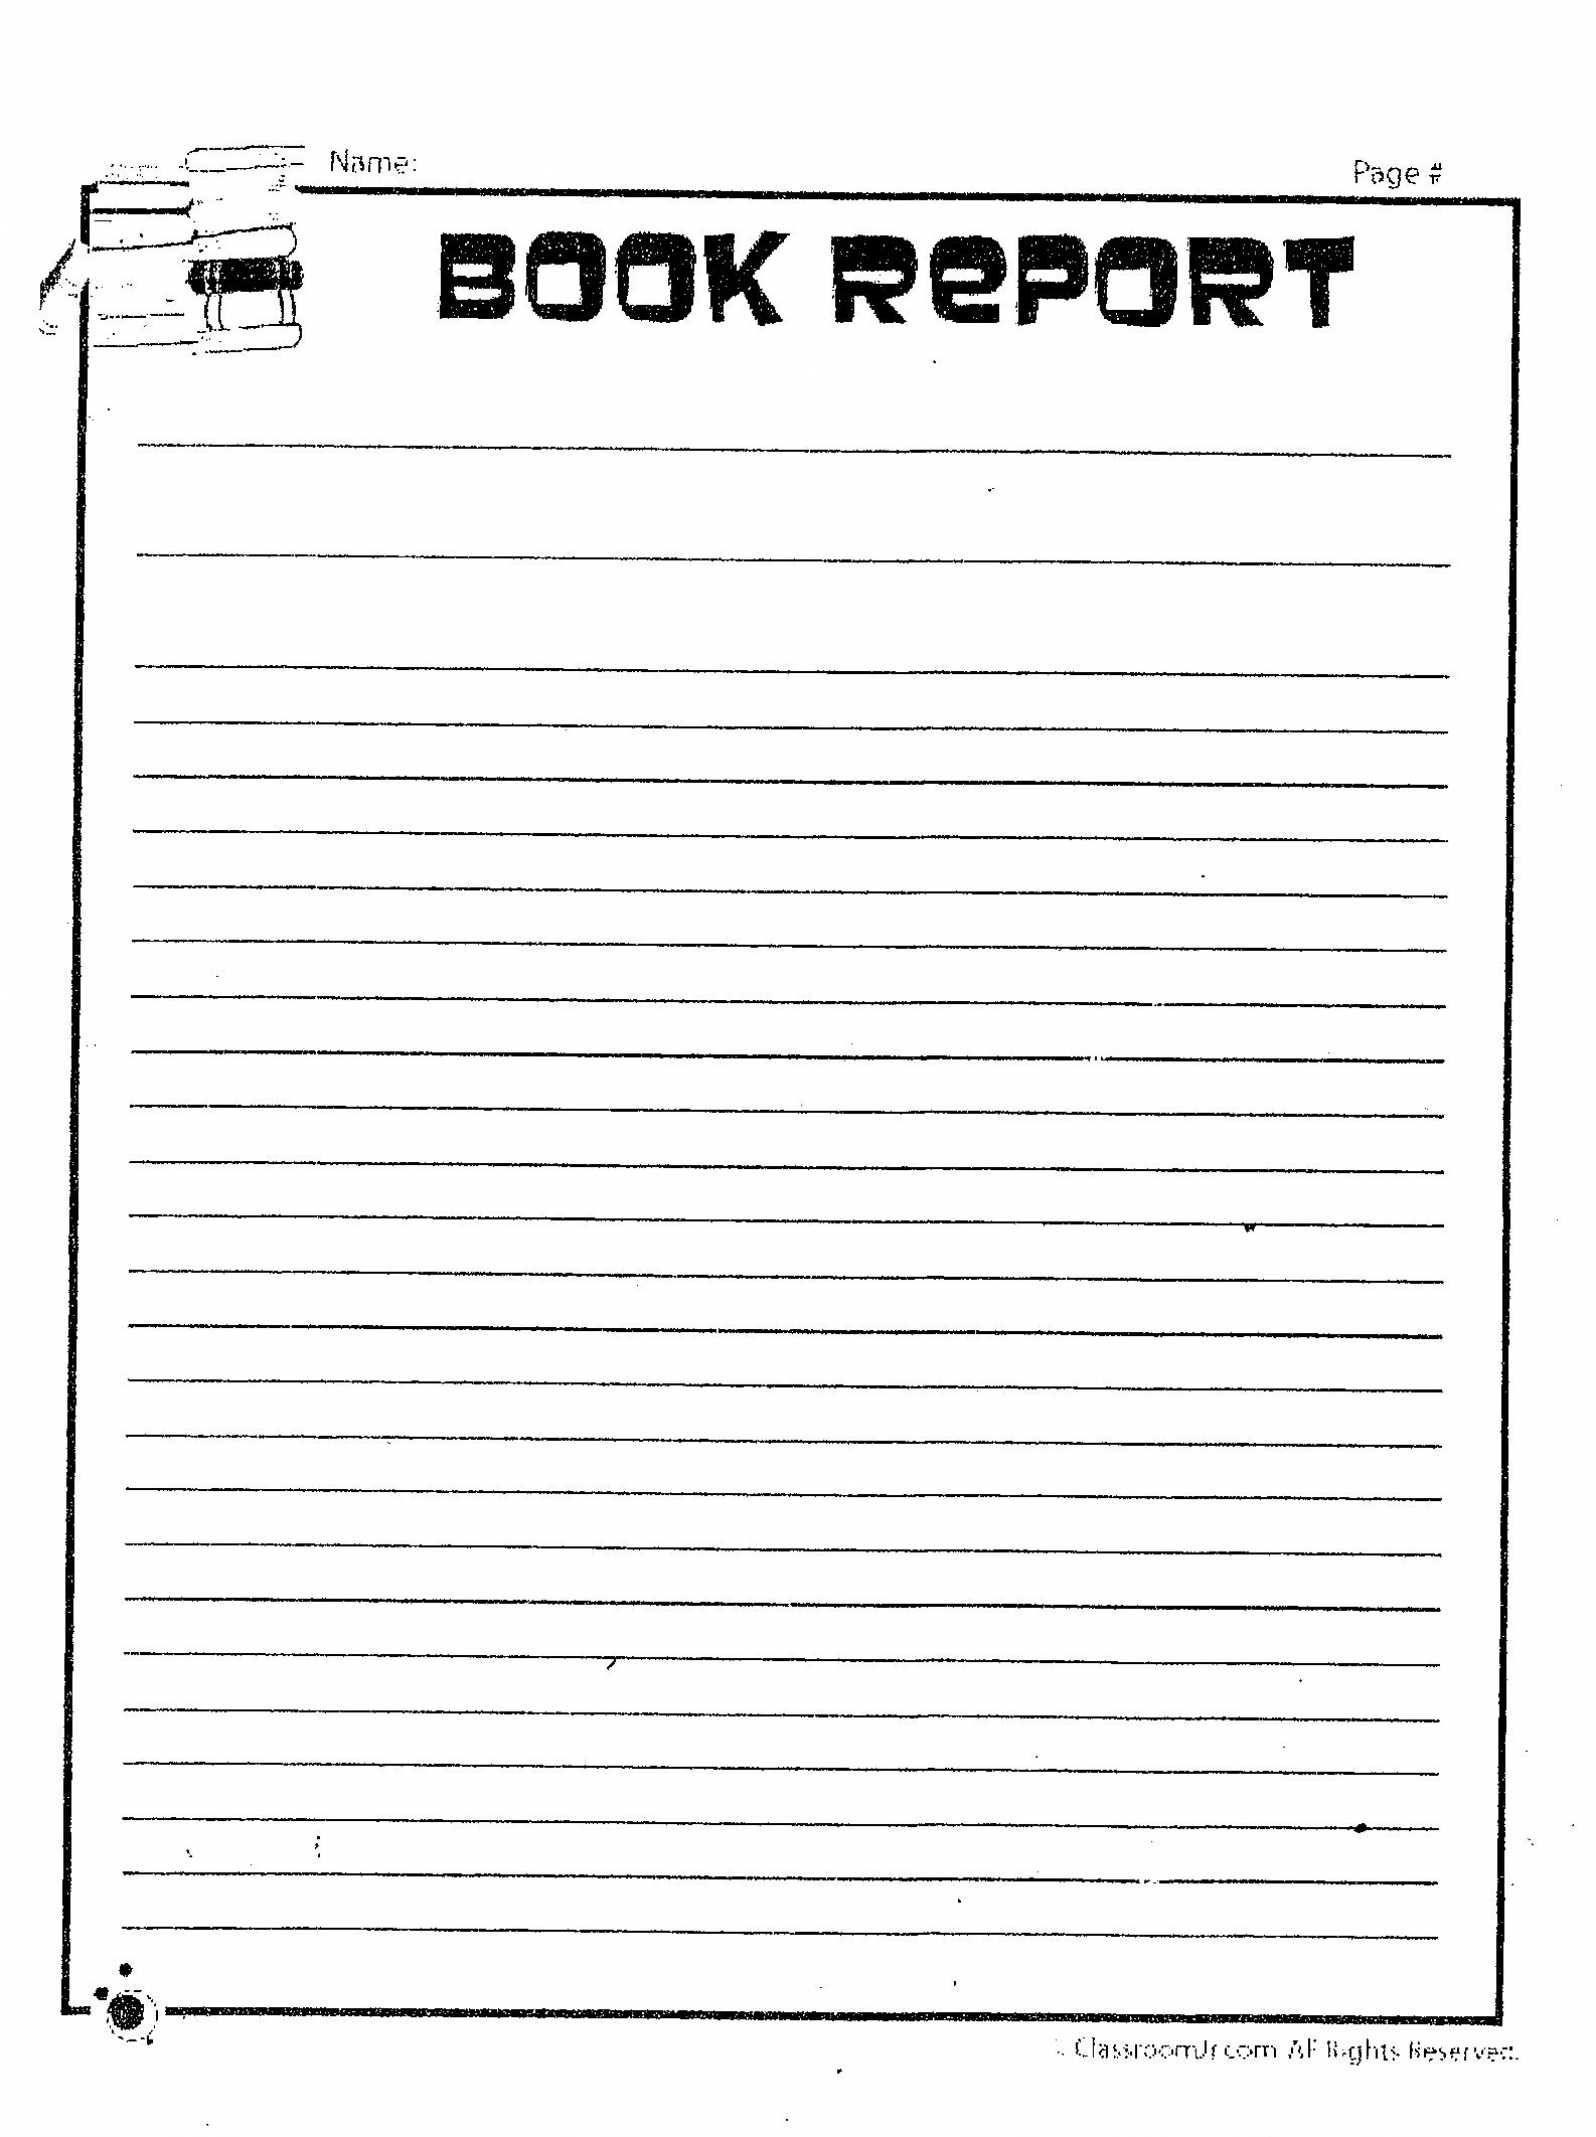 grade 2 book report template. englishlinxcom book report worksheets ...